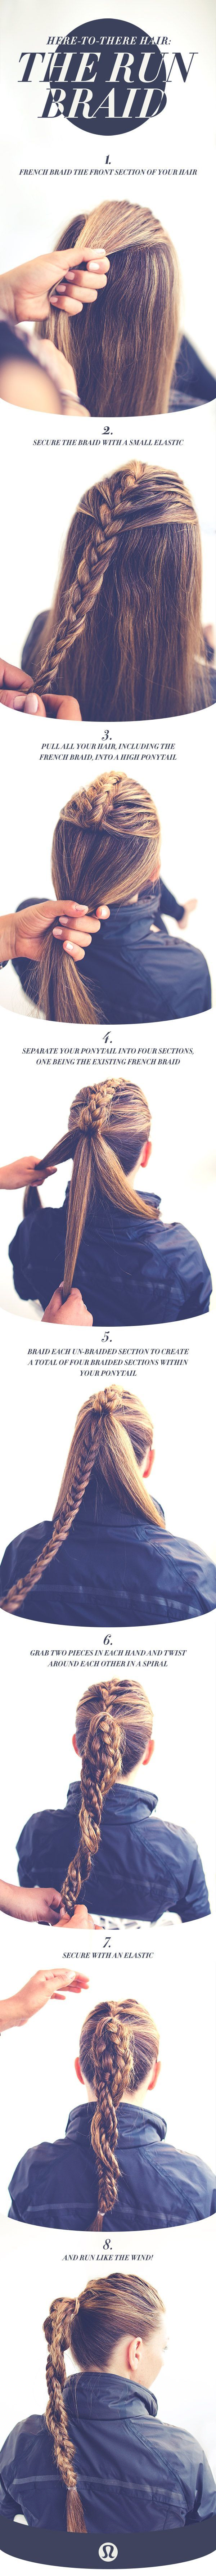 The amazing 'Run Braid' insctructions